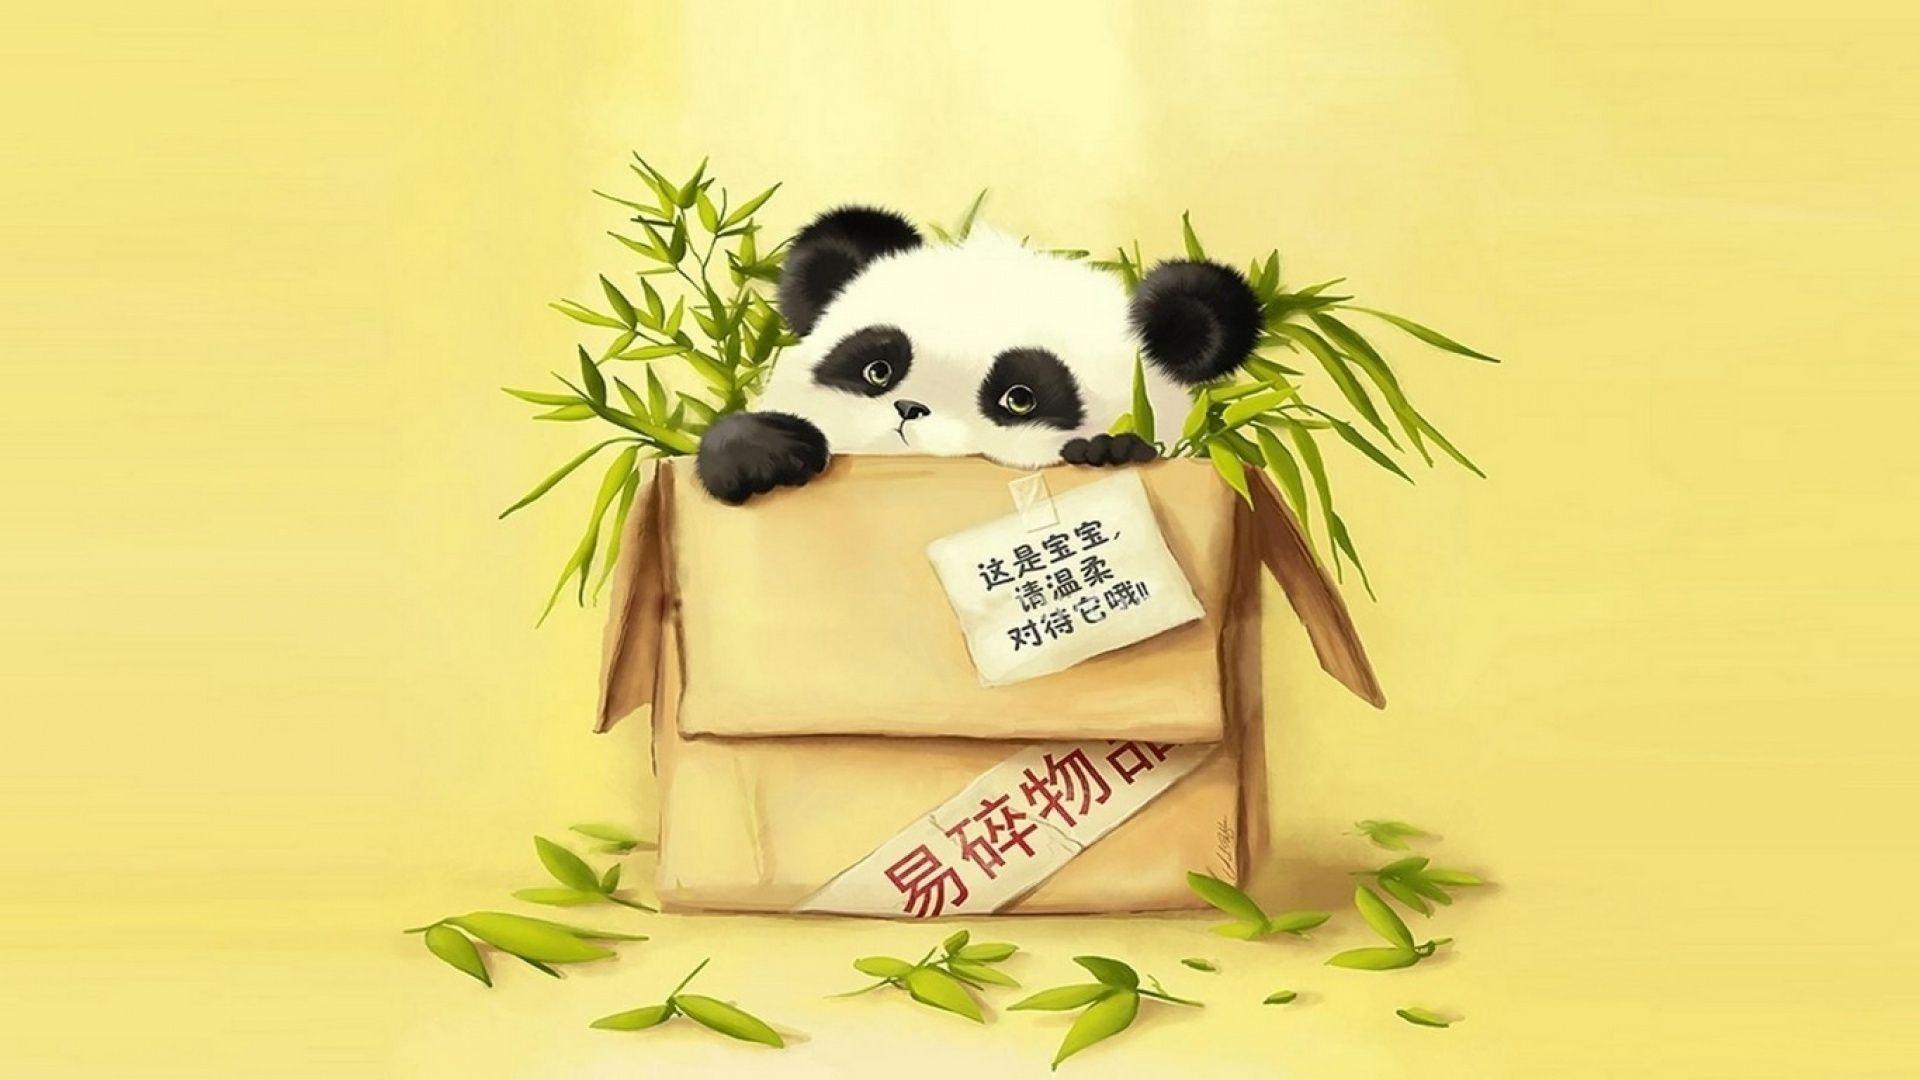 Baby Panda Wallpaper 60 Pictures